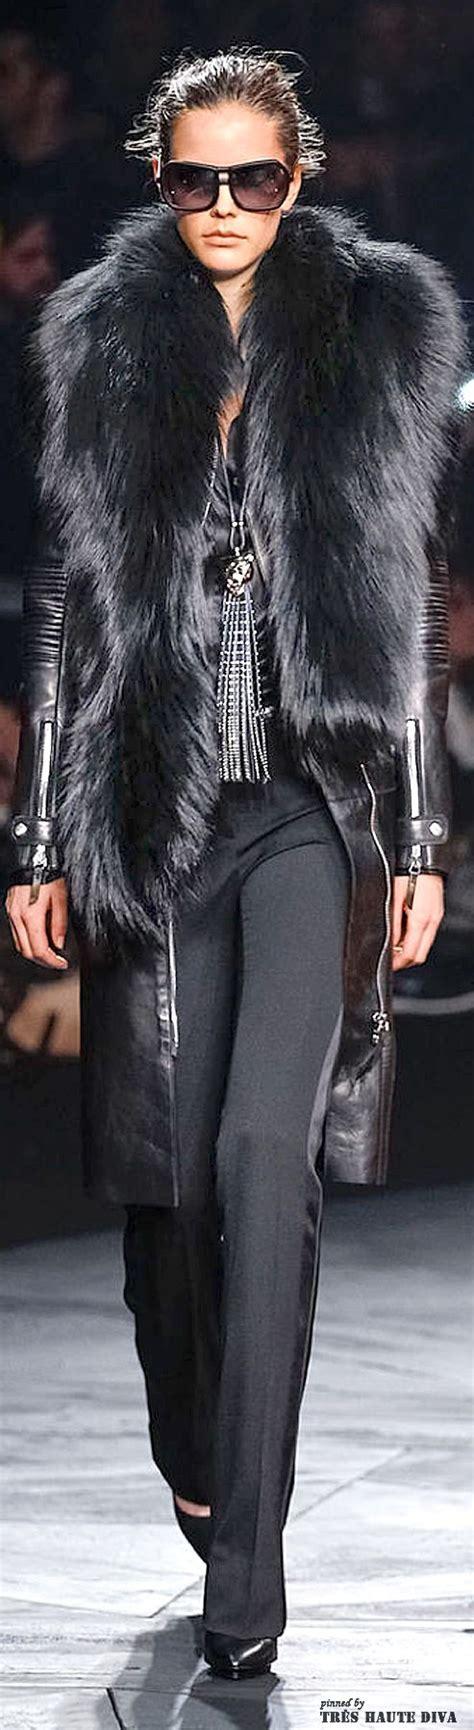 Mellan Fashion Jaket Abu milan fashion week roberto cavalli fall winter 2014 rtw decoart24 pl all black fasion